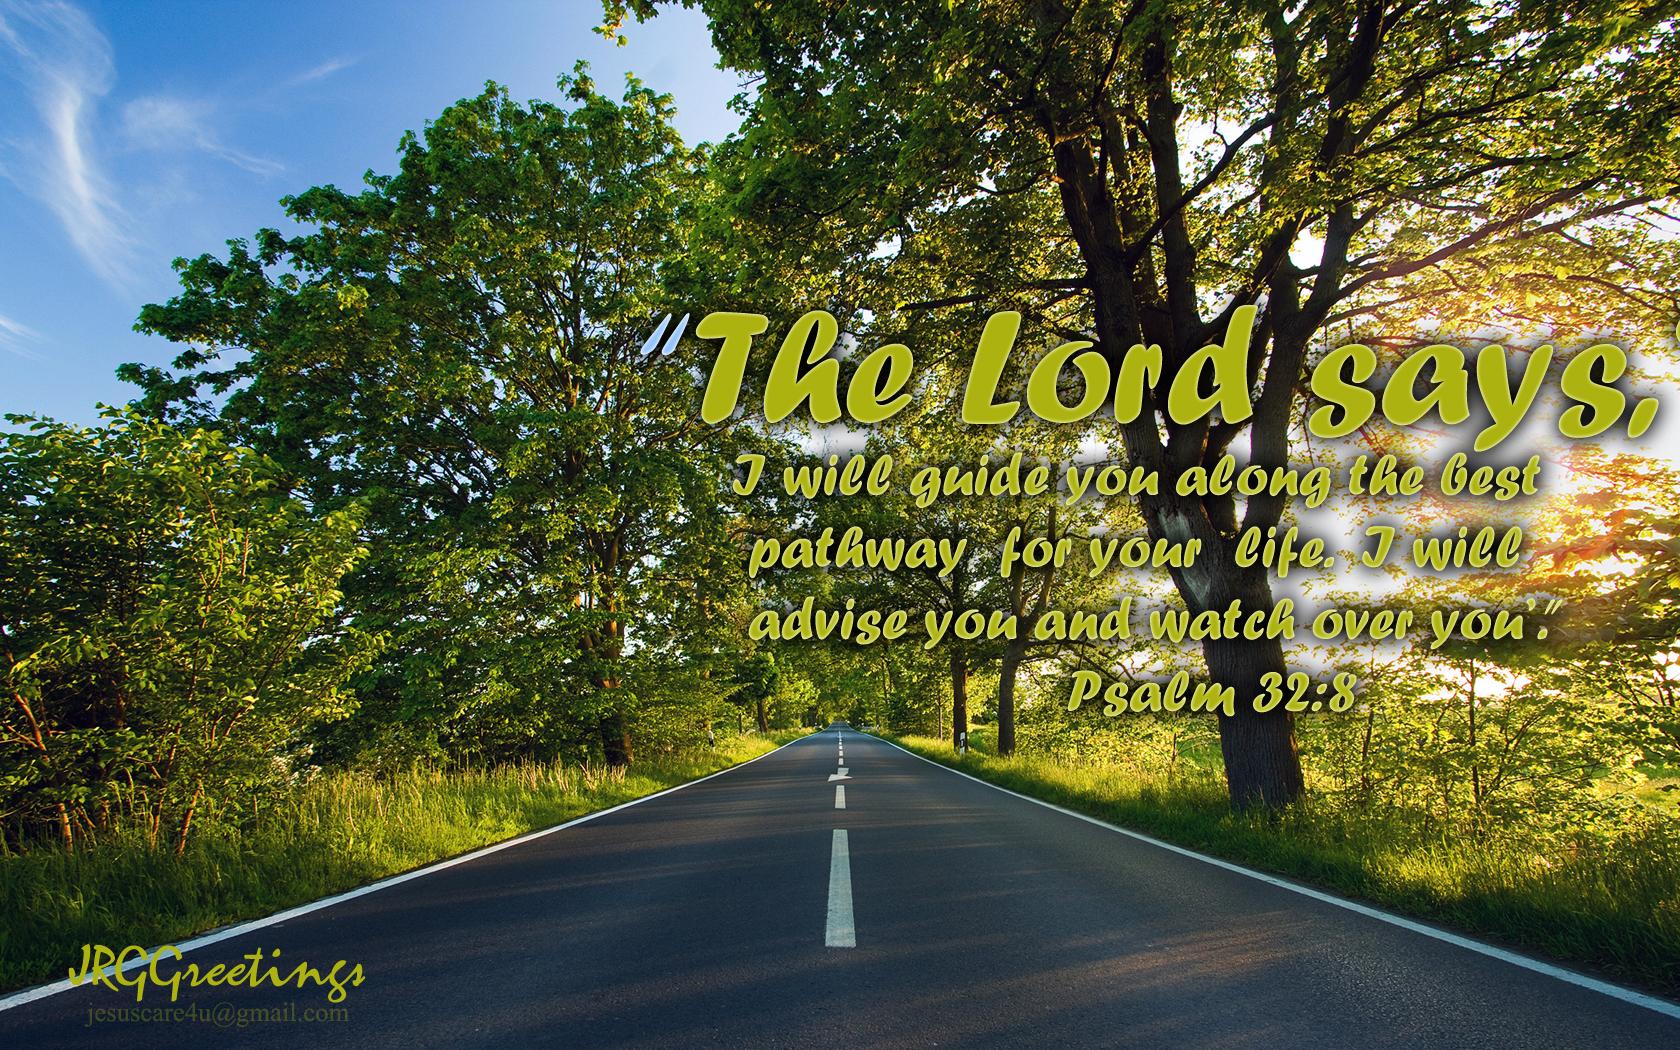 Psalm 32:8 - With Loving Eye Wallpaper - Christian